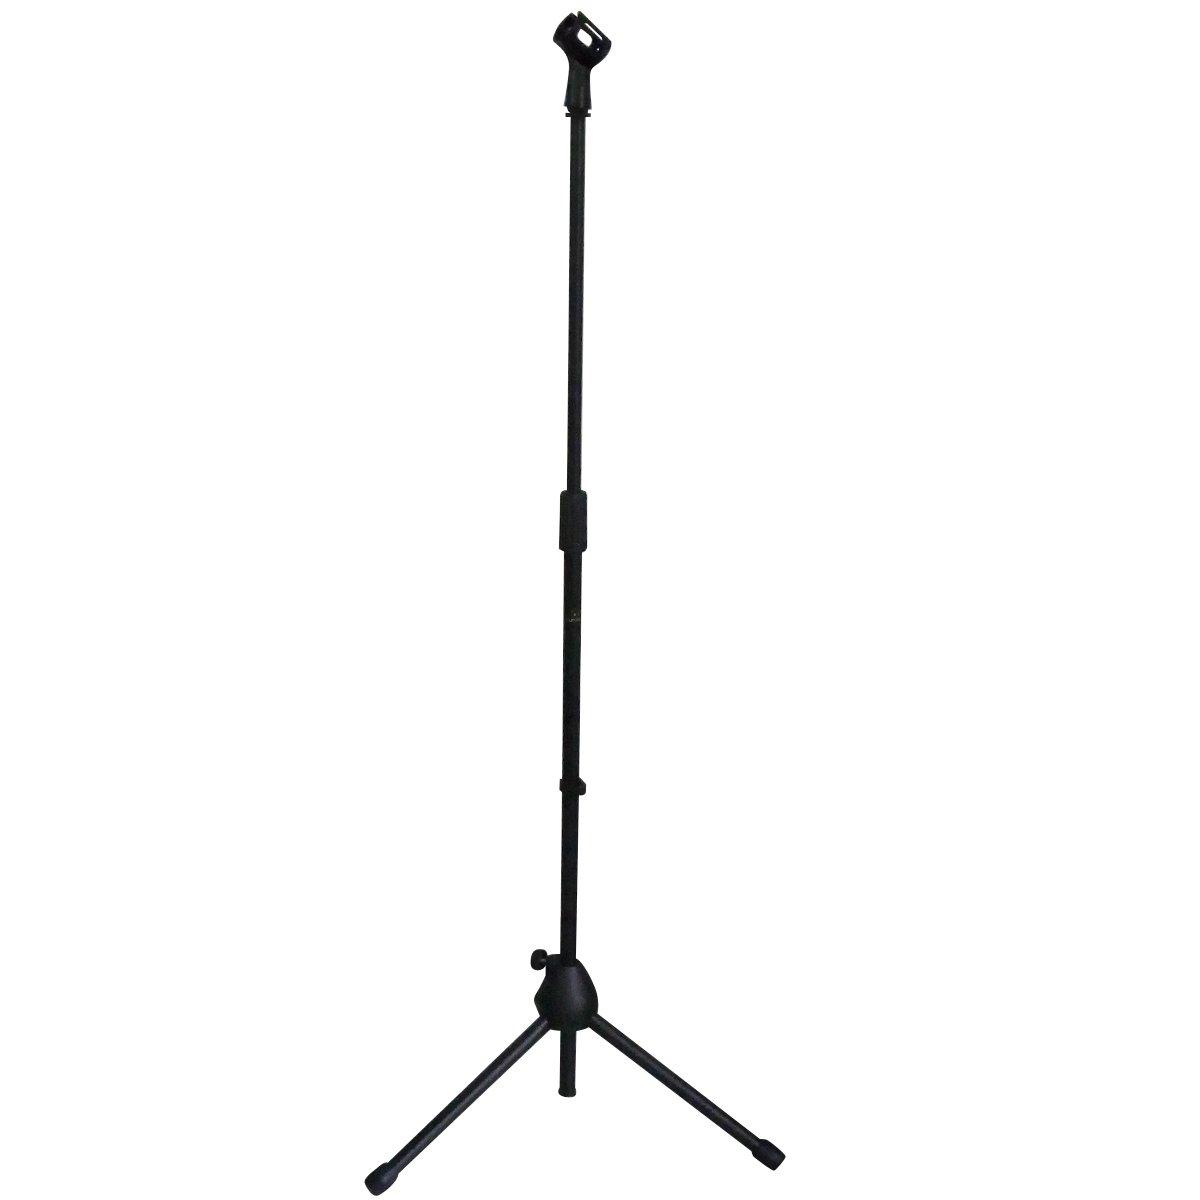 Yamaha Microphone Stand